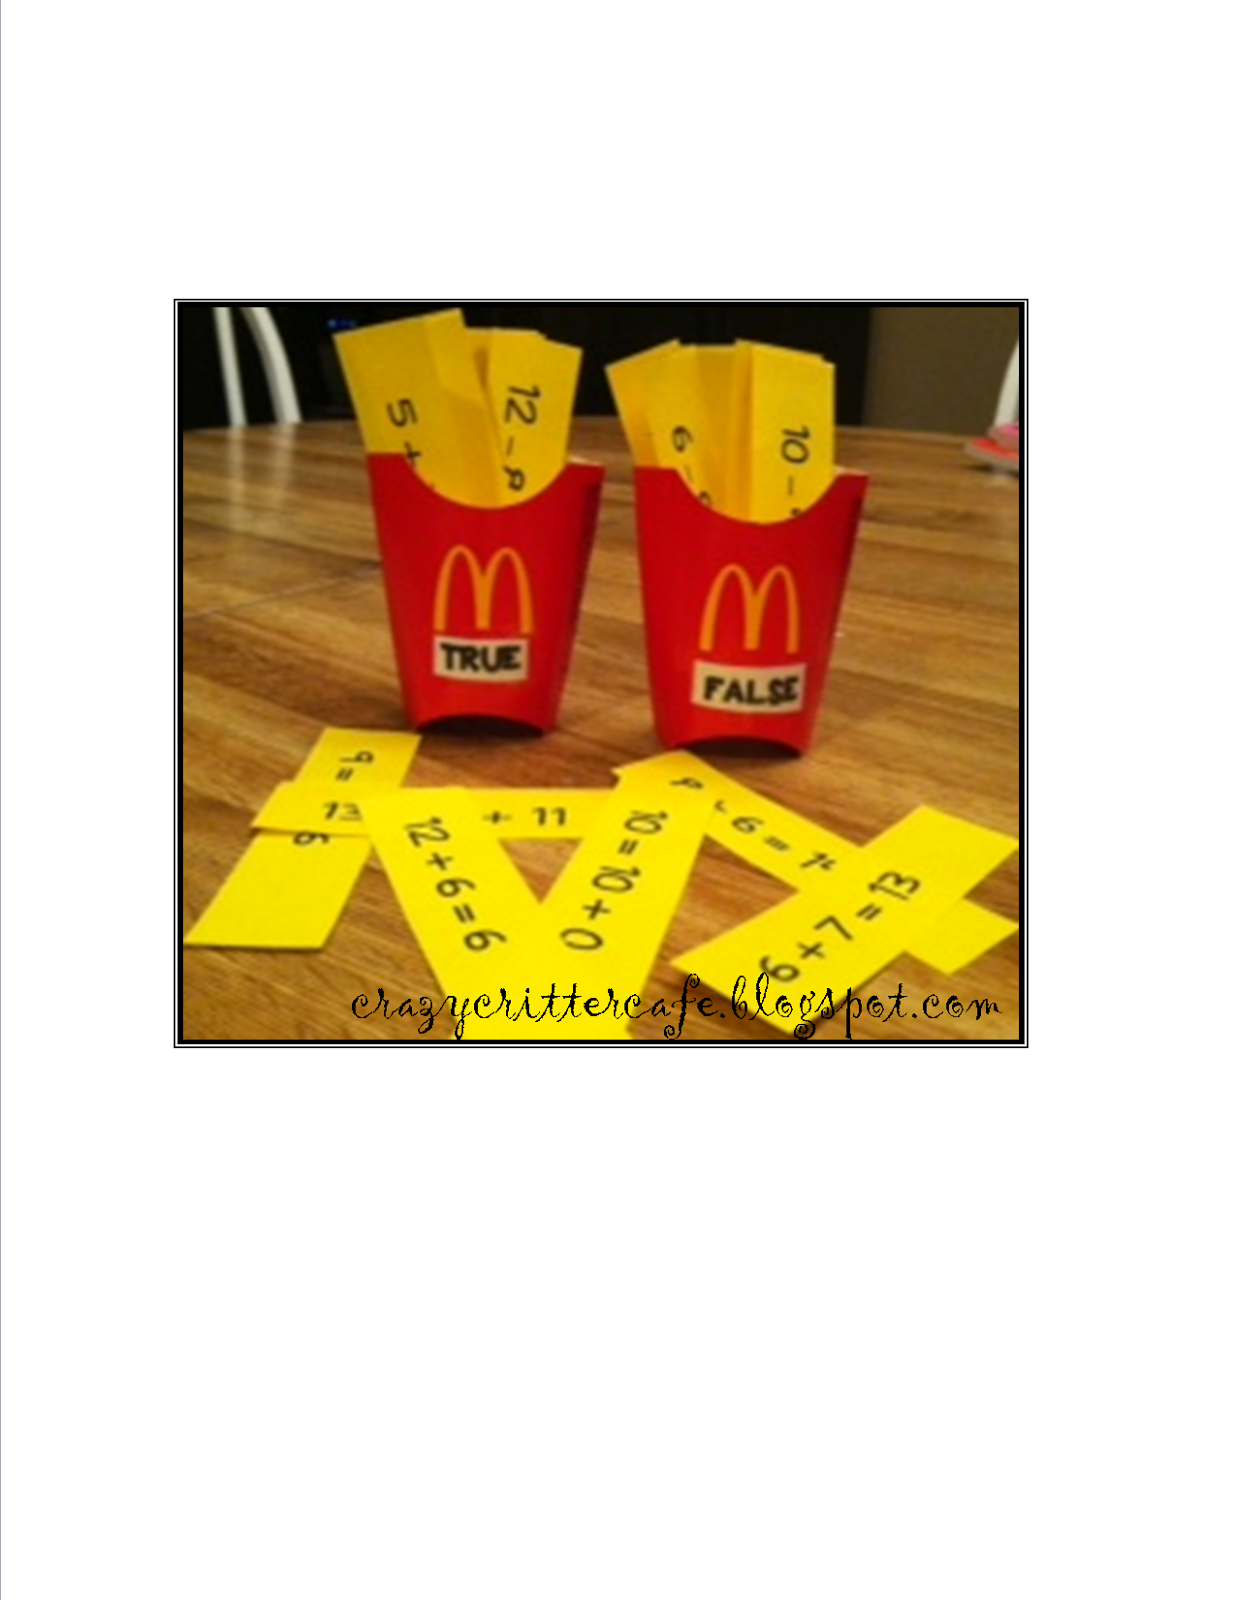 http://crazycrittercafe.blogspot.com/2014/03/math-fact-fries-and-freebies.html